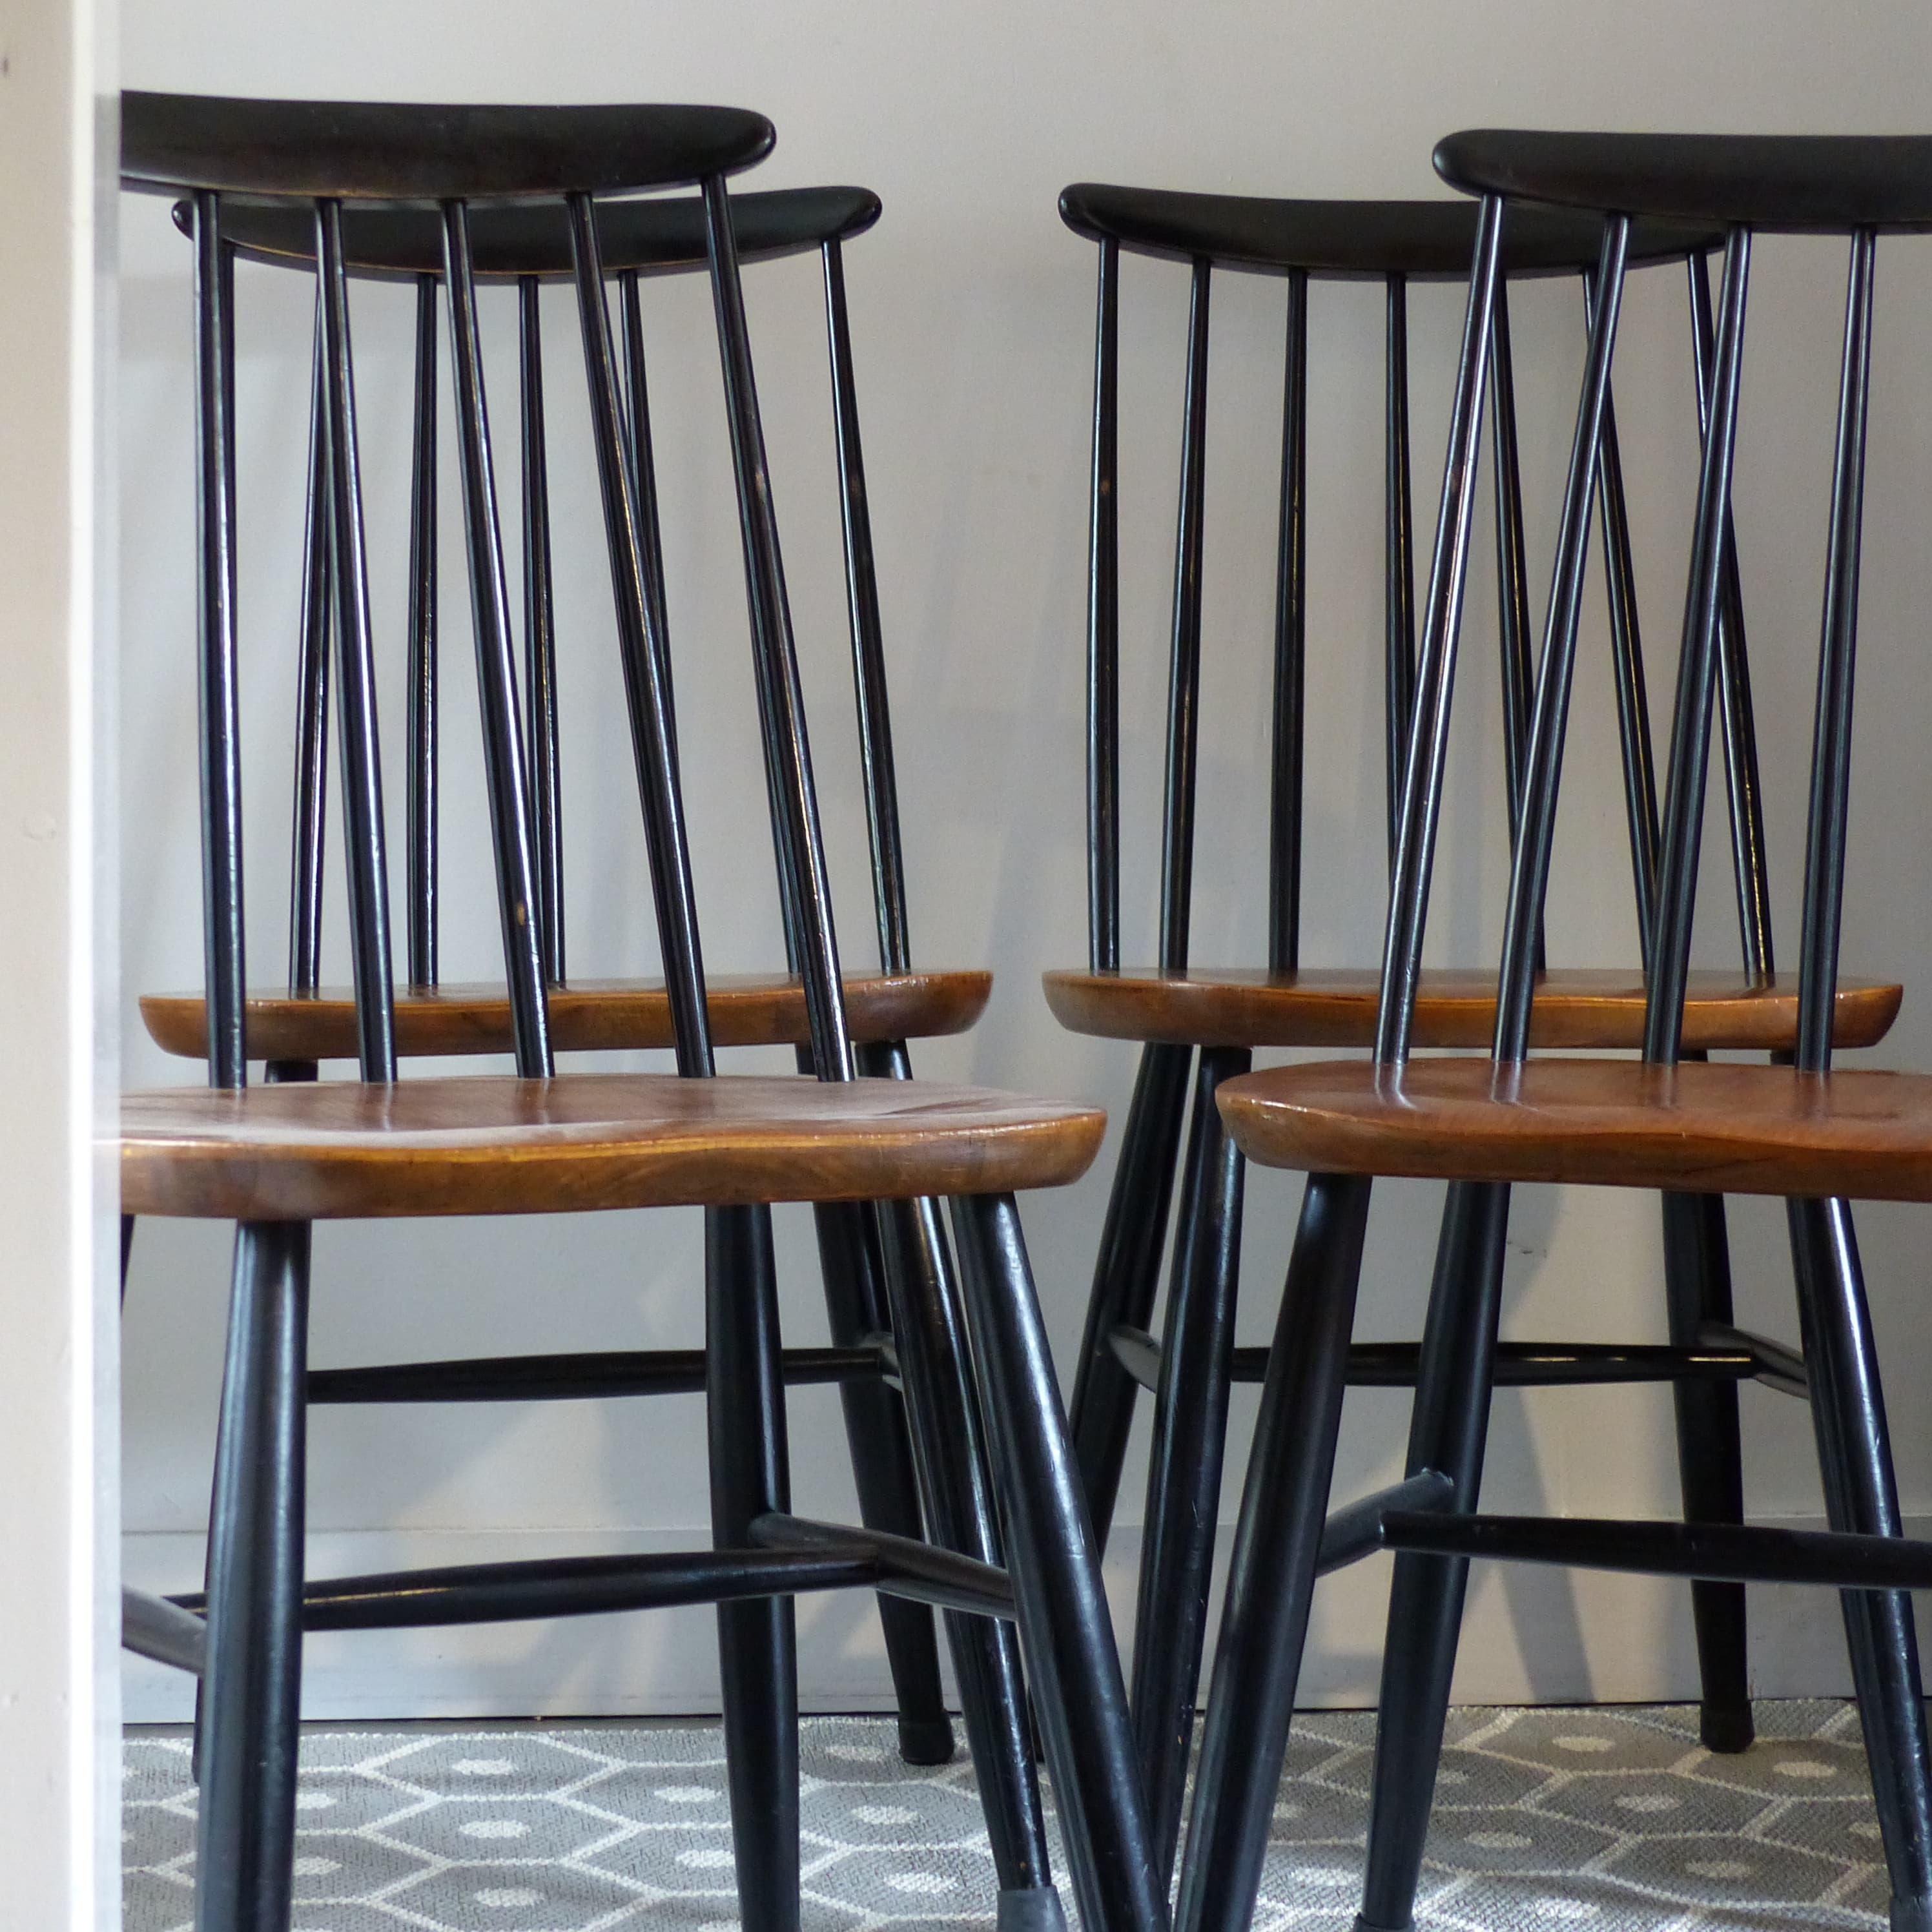 chaises scandinaves lignedebrocante brocante en ligne chine pour vous meubles vintage et. Black Bedroom Furniture Sets. Home Design Ideas